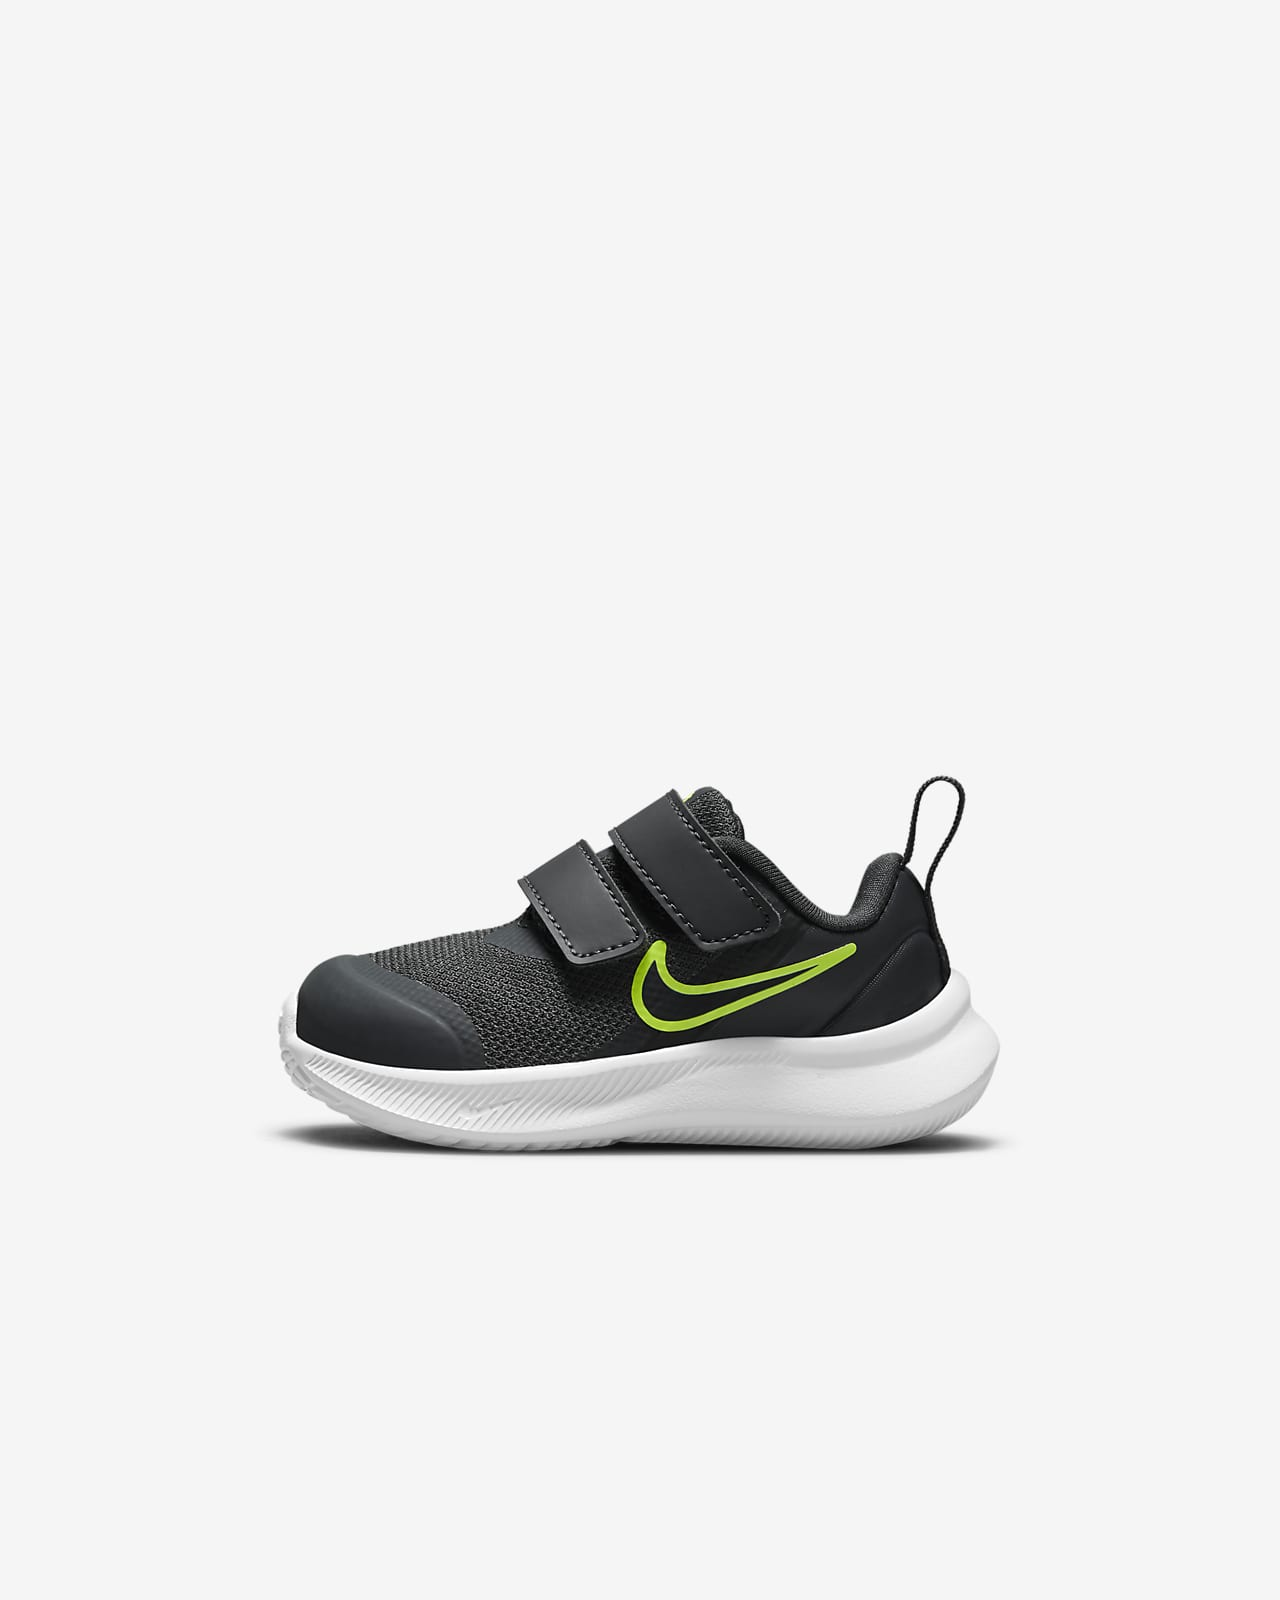 Nike Star Runner 3 Baby/Toddler Shoes